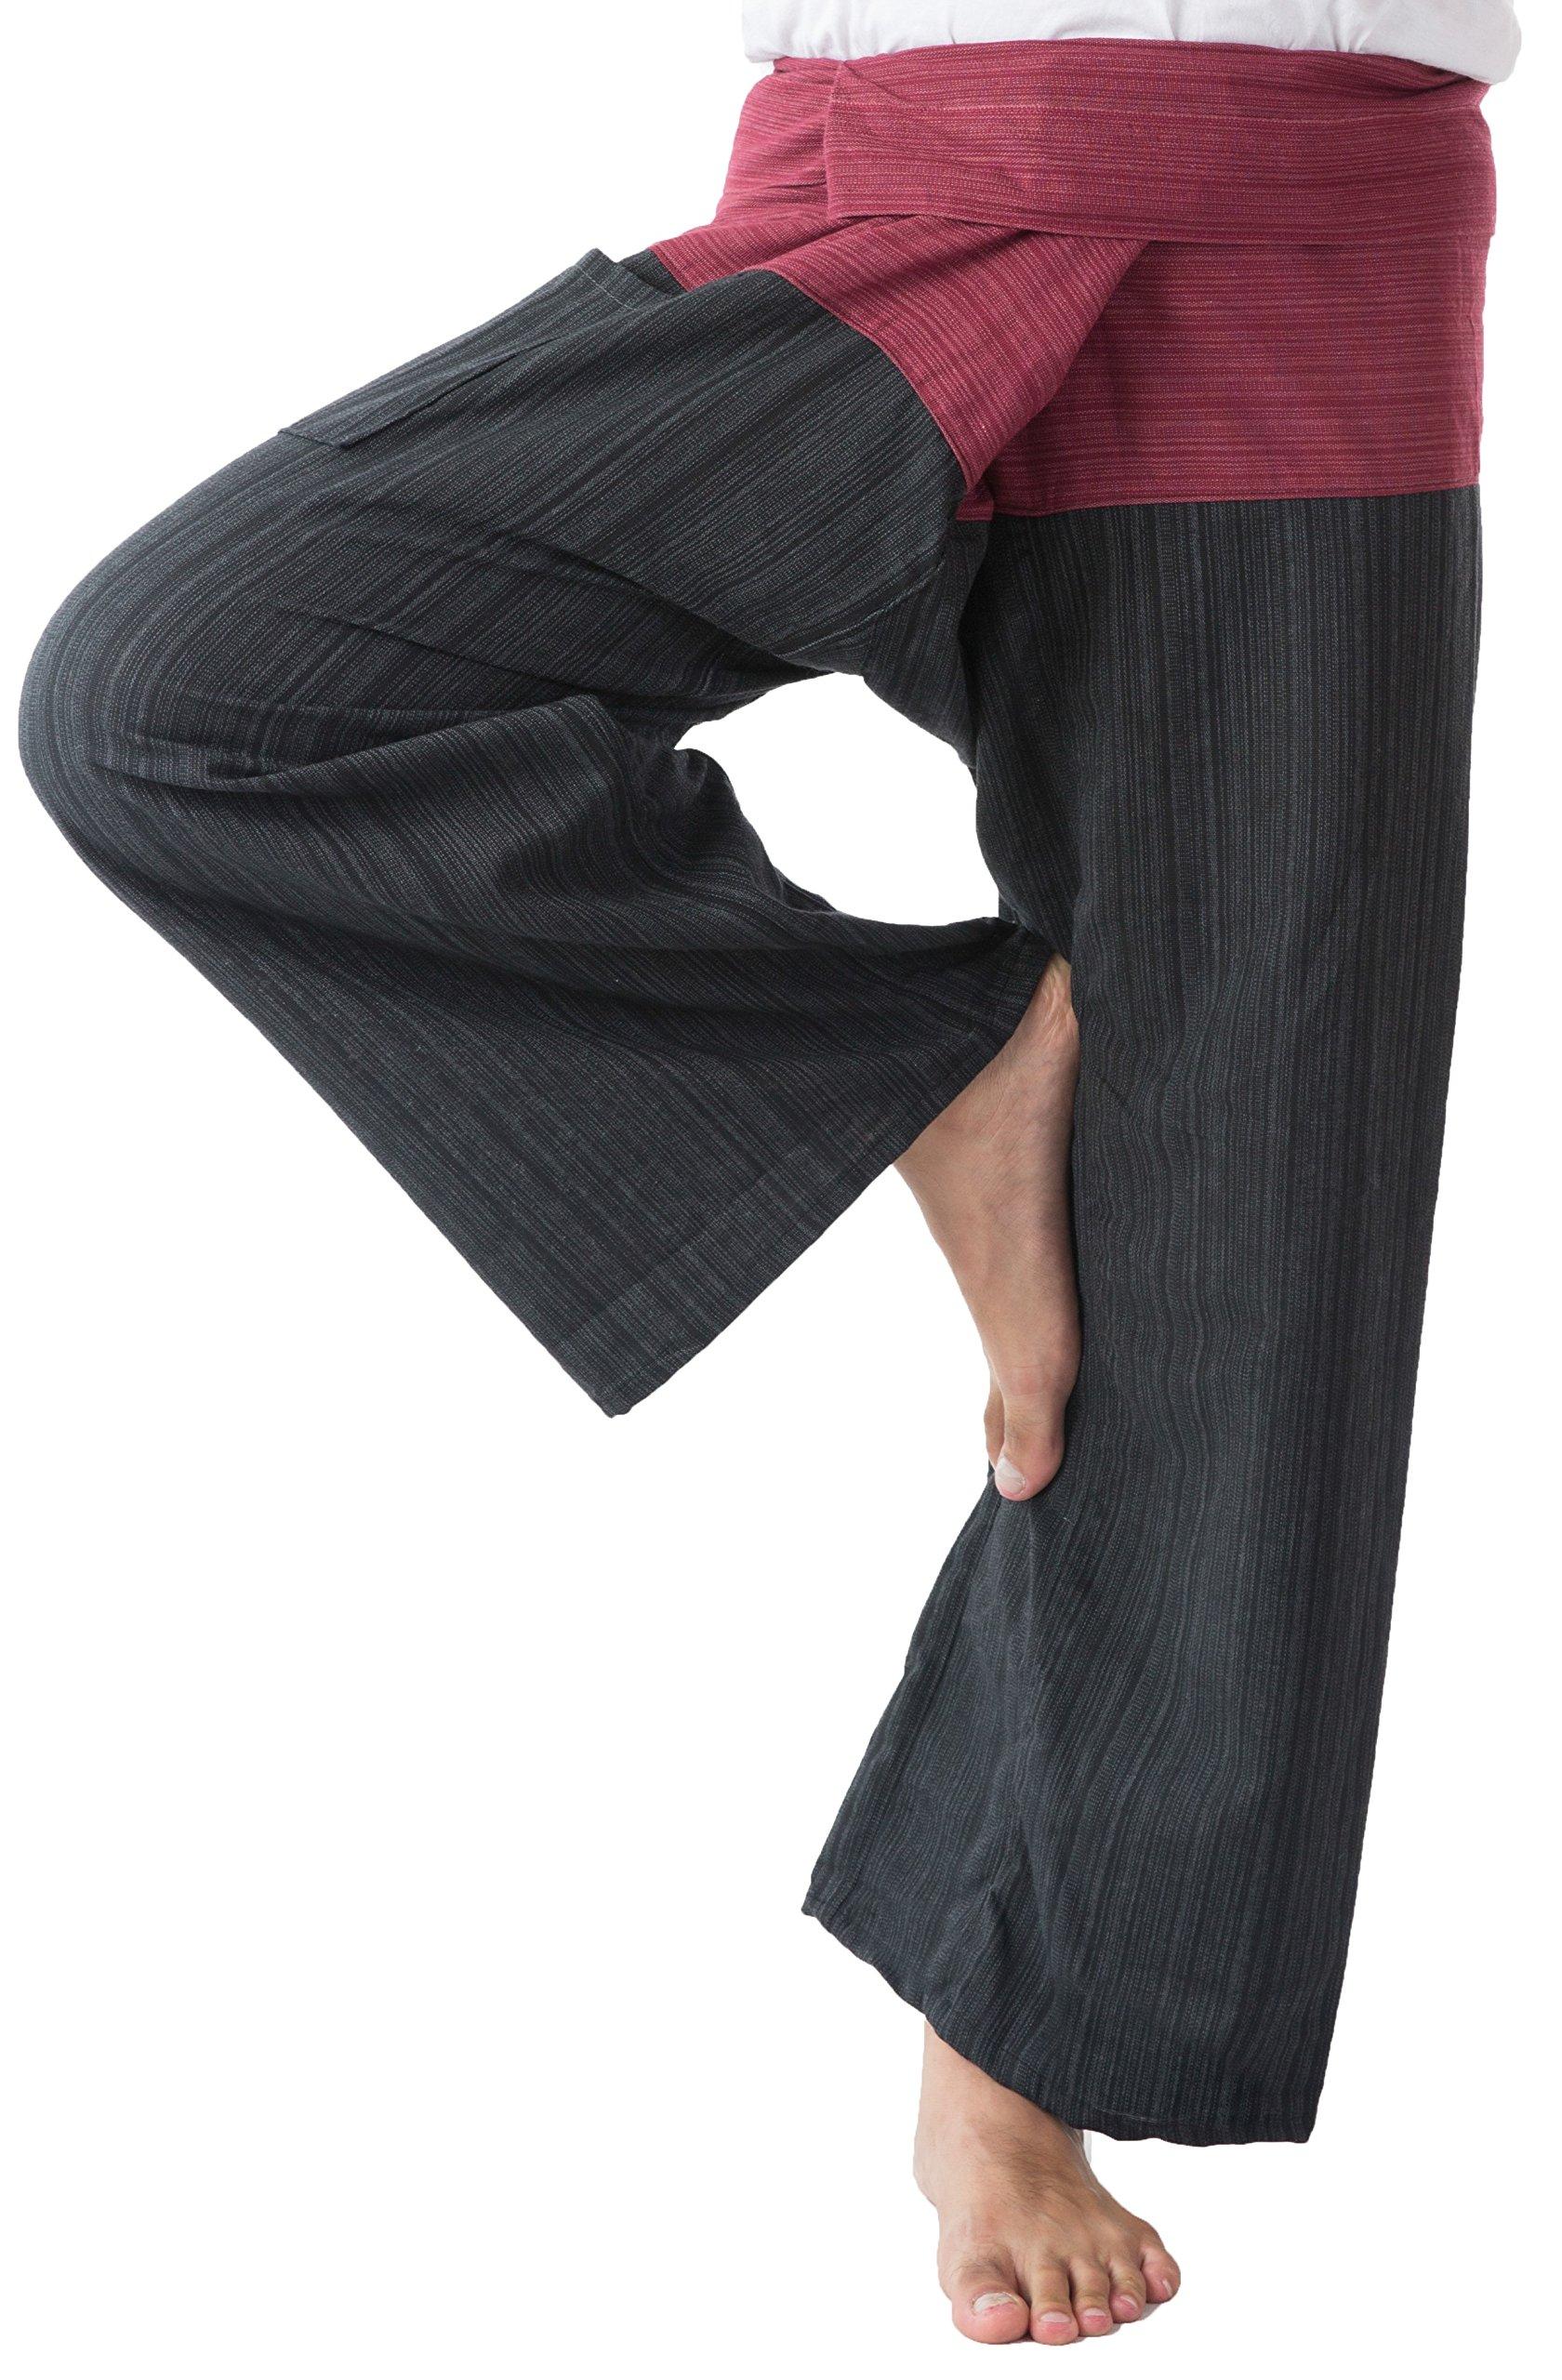 Thai Fisherman Pants Men's Yoga Trousers Red and Black 2 Tone Pant